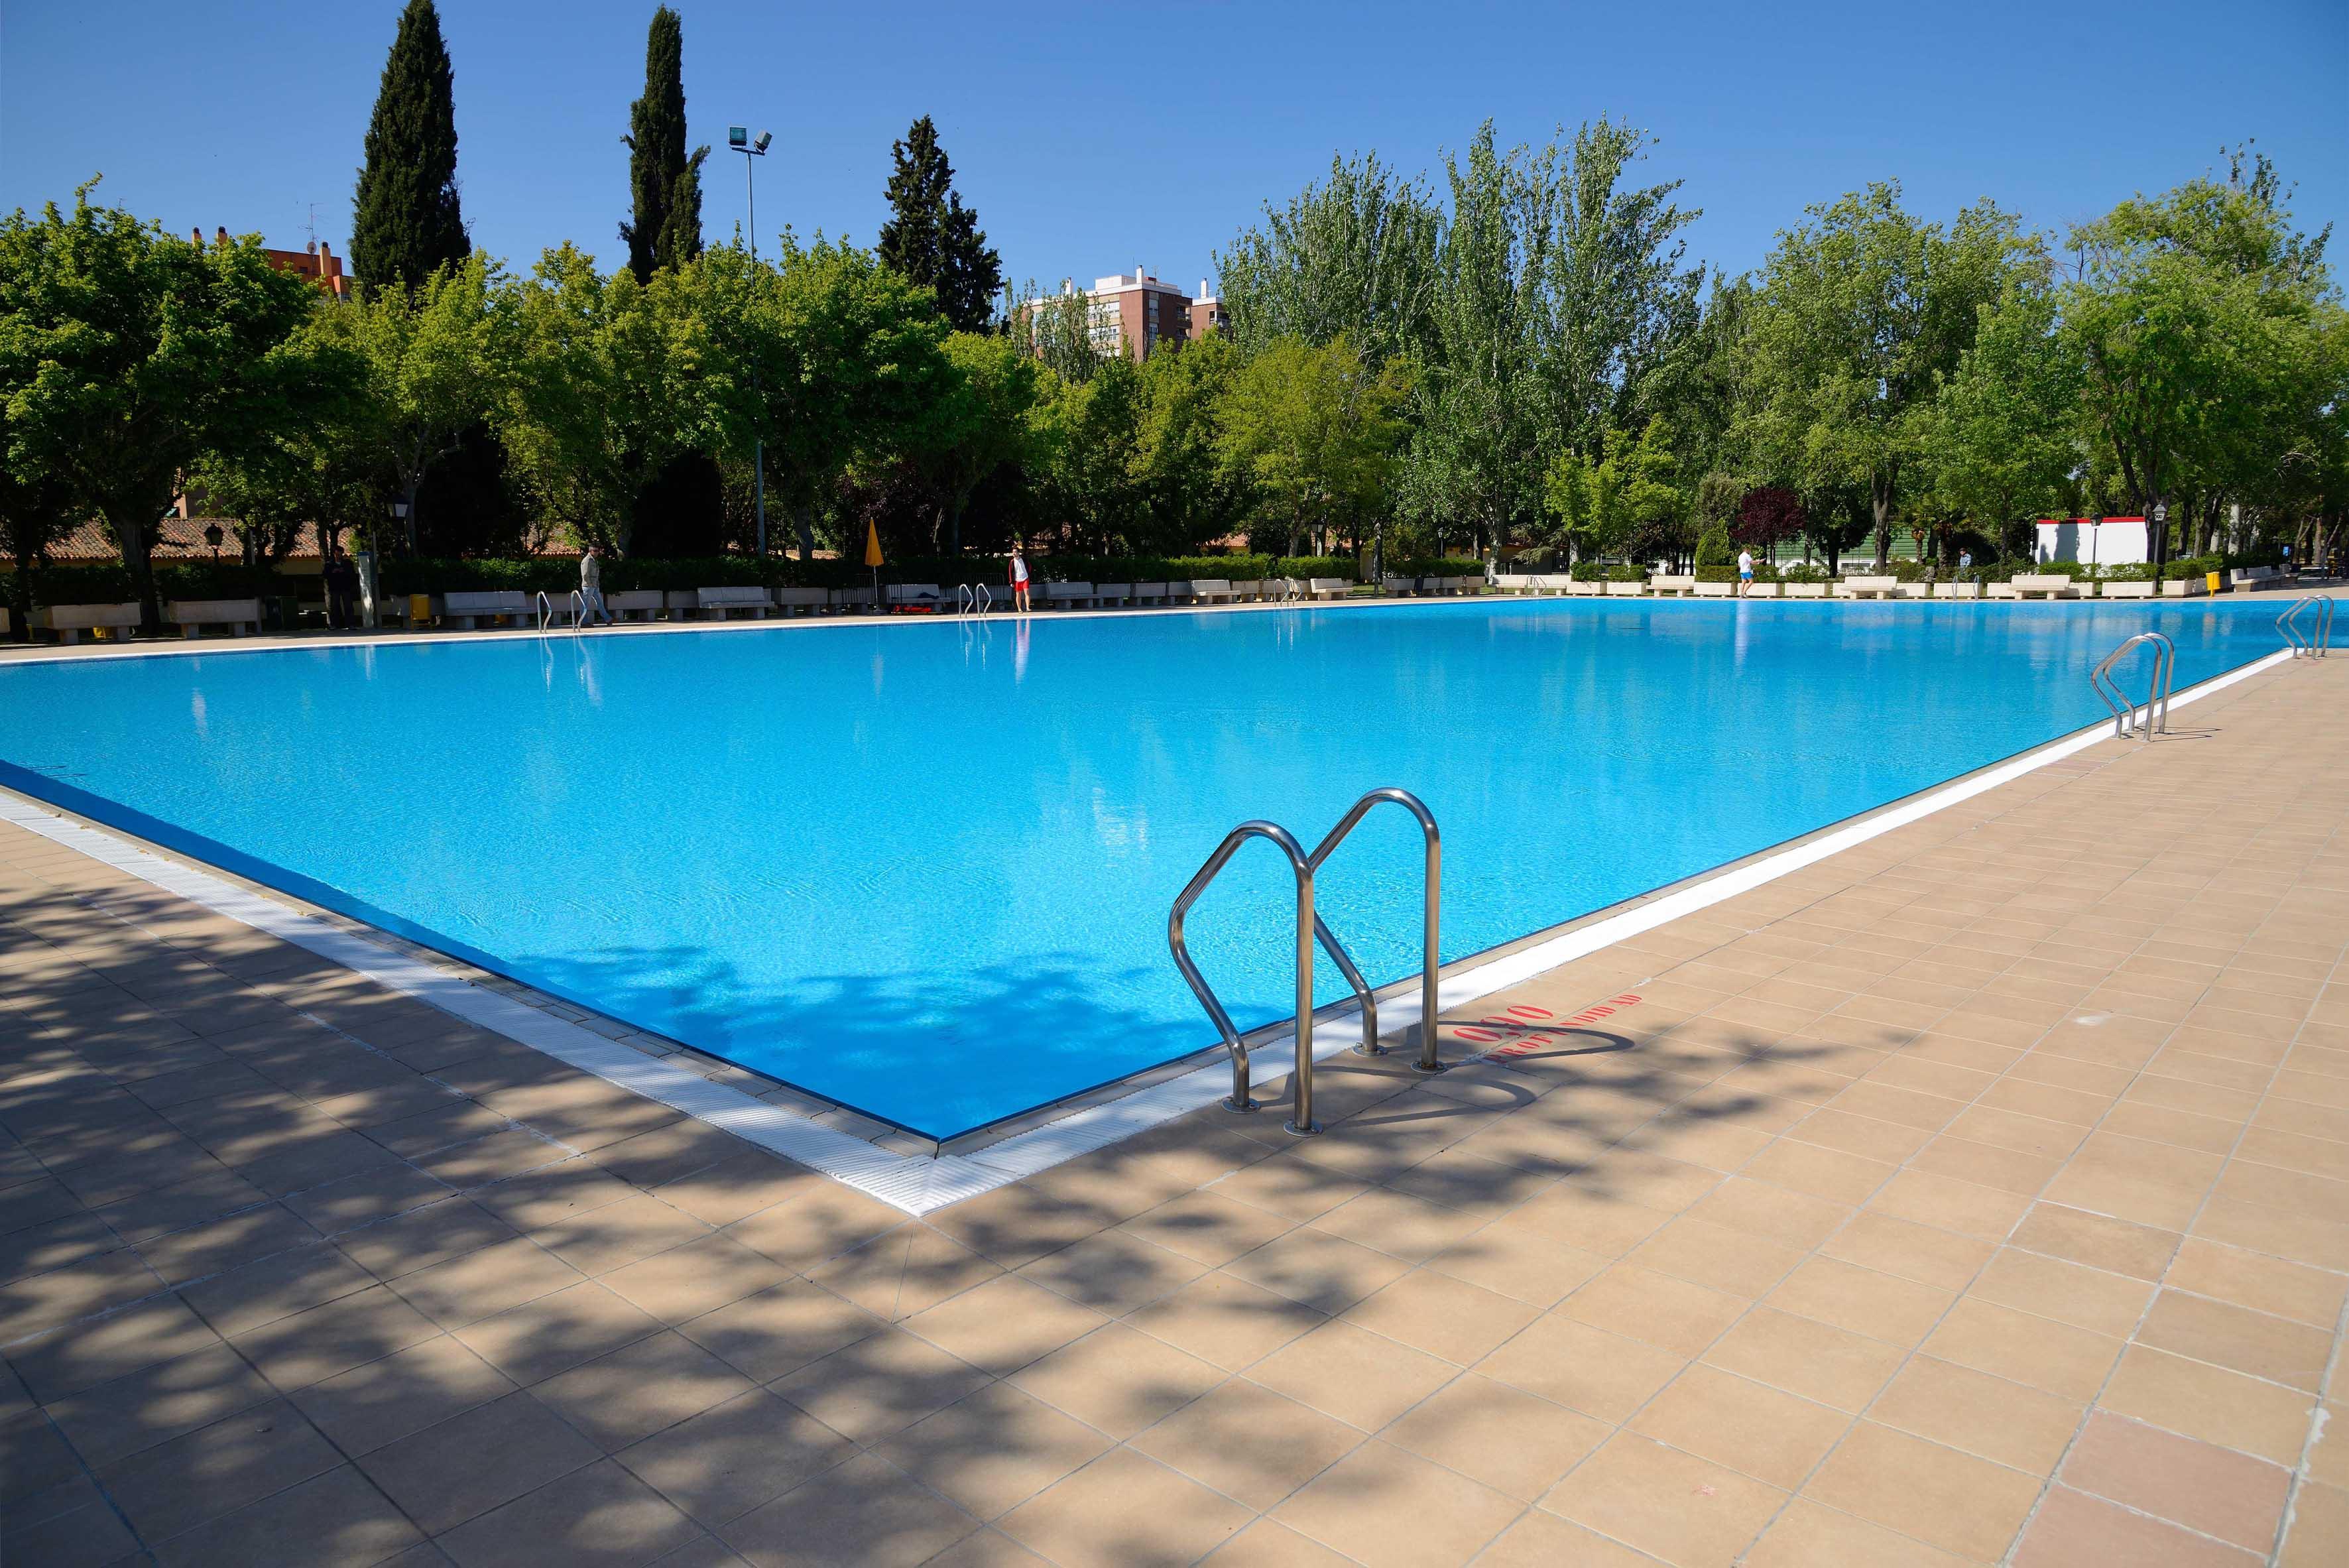 Las piscinas municipales de verano cierran ma ana for Piscina municipal casa de campo